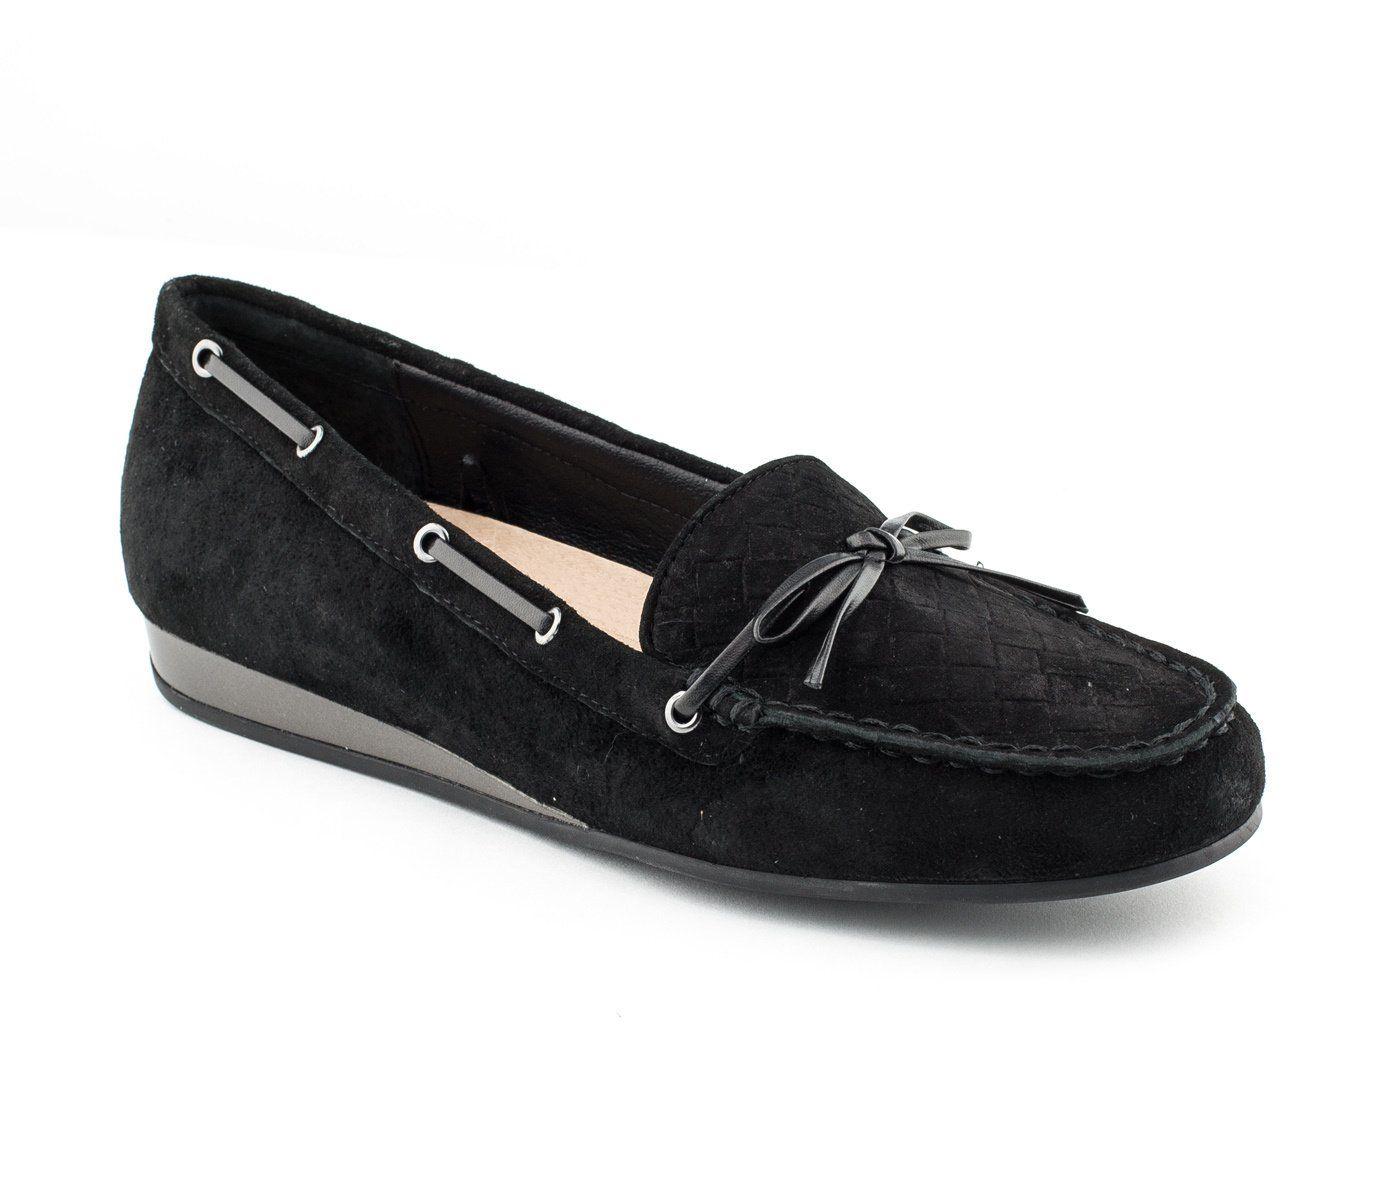 Hush Puppies Casual Wedges Hooper Buy Women Shoes Online